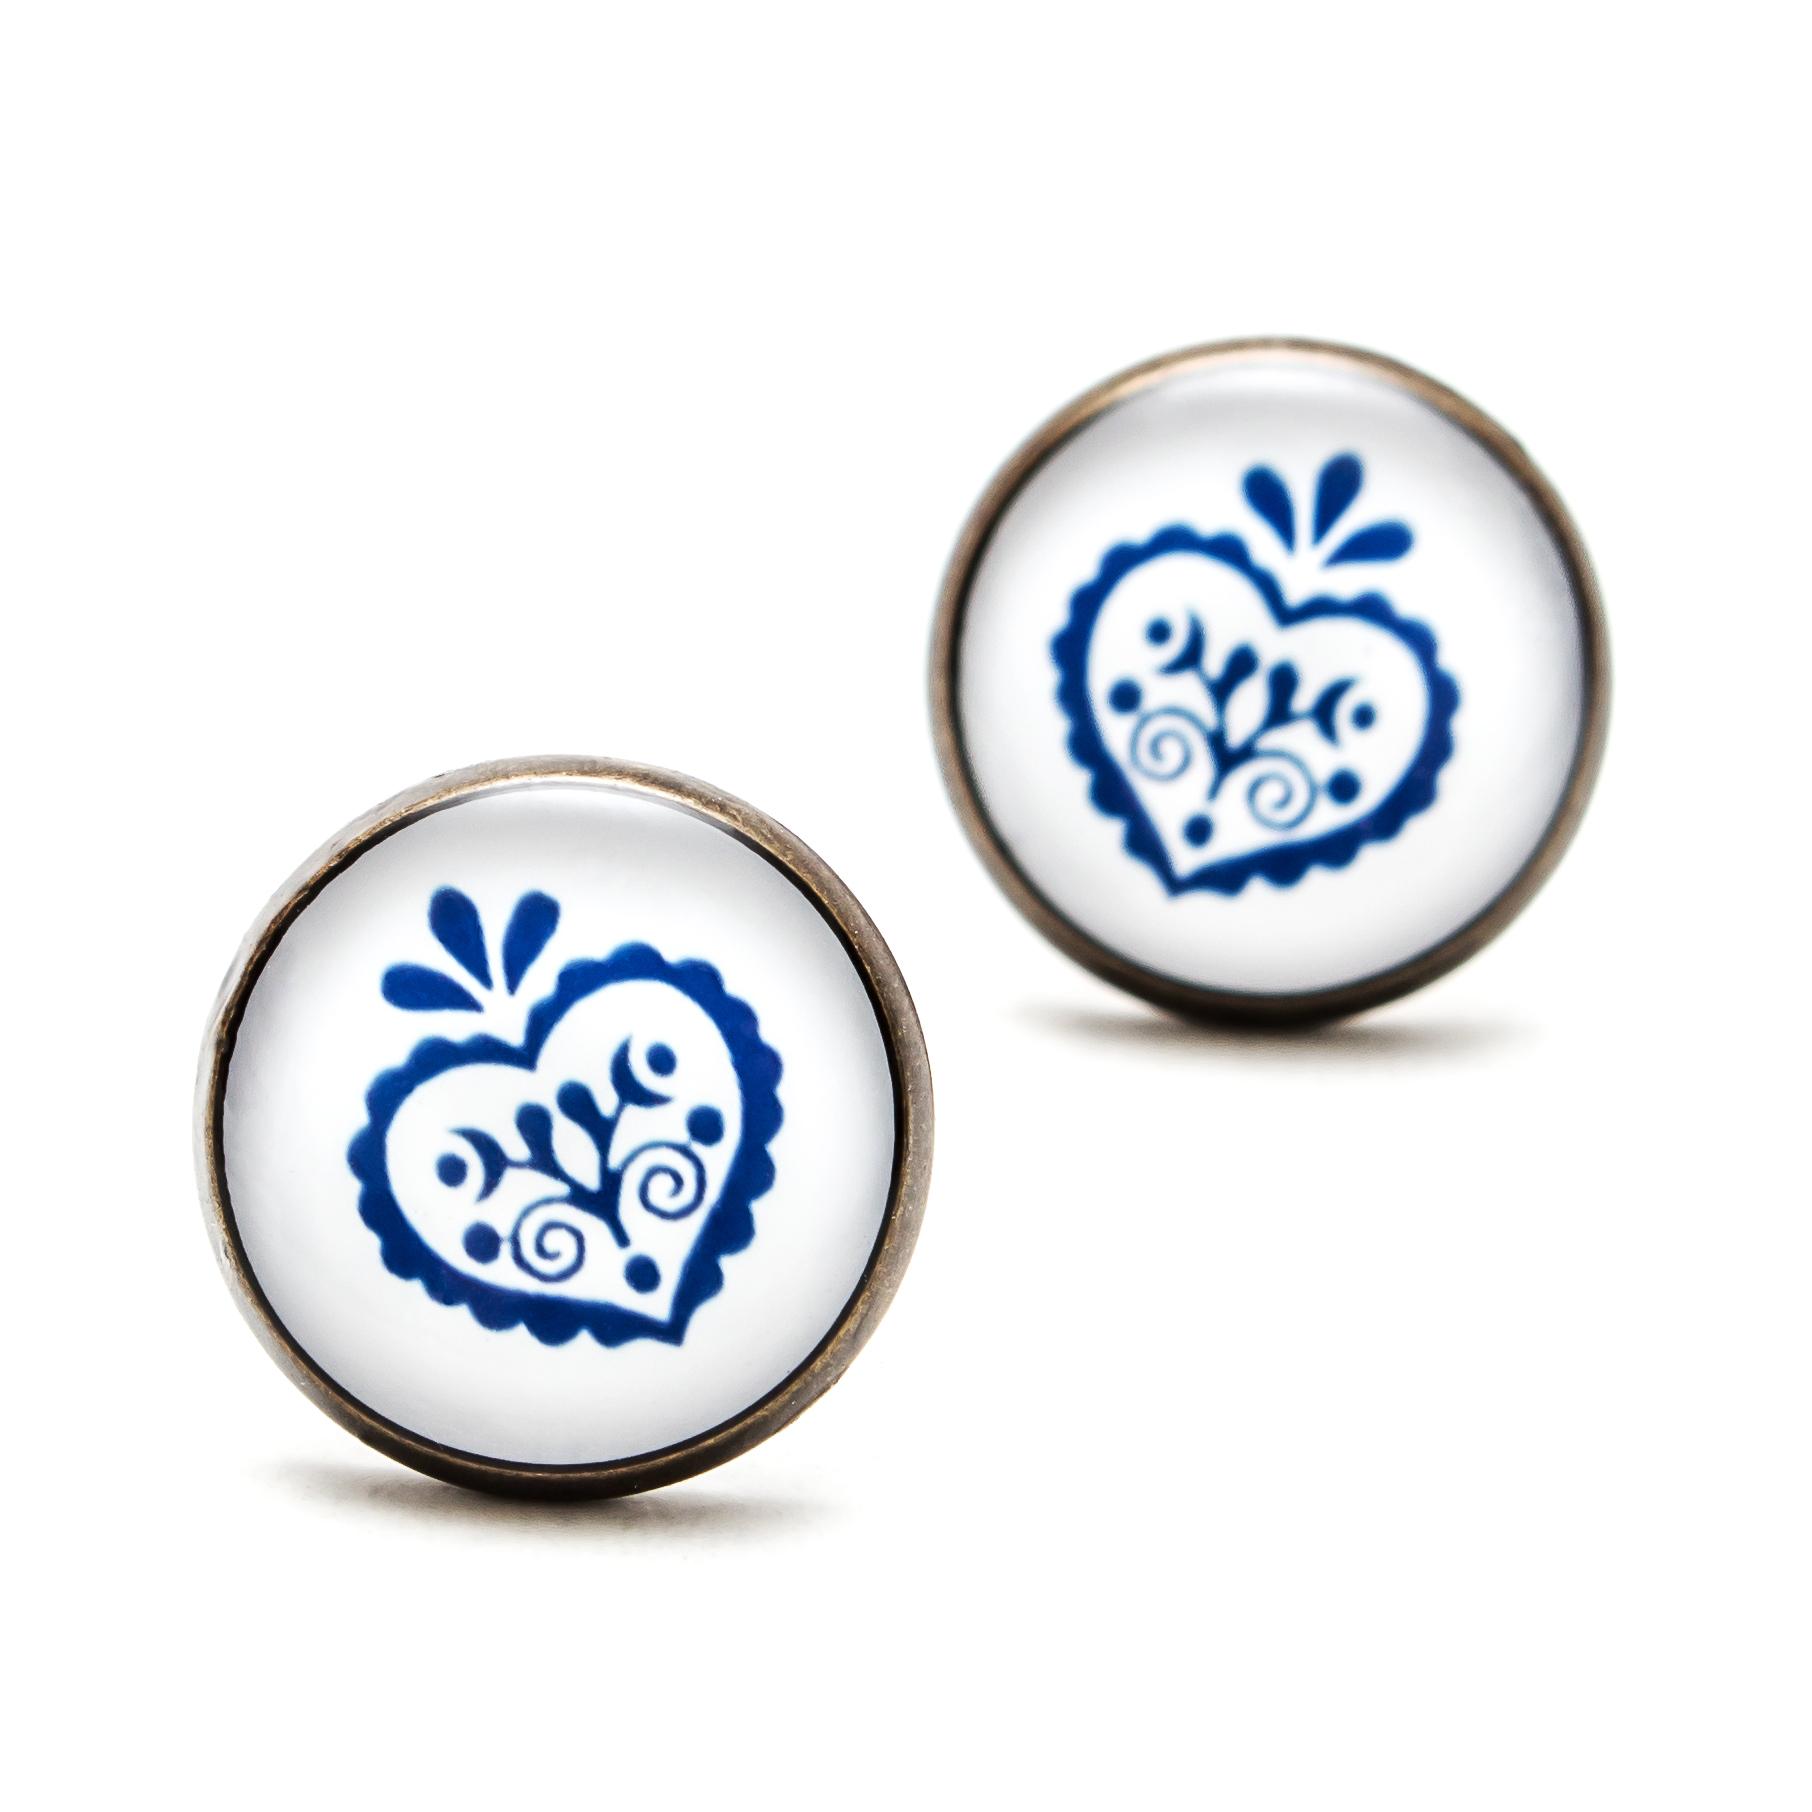 Séria Folk minimal - Srdiečko ornament modrý 00447